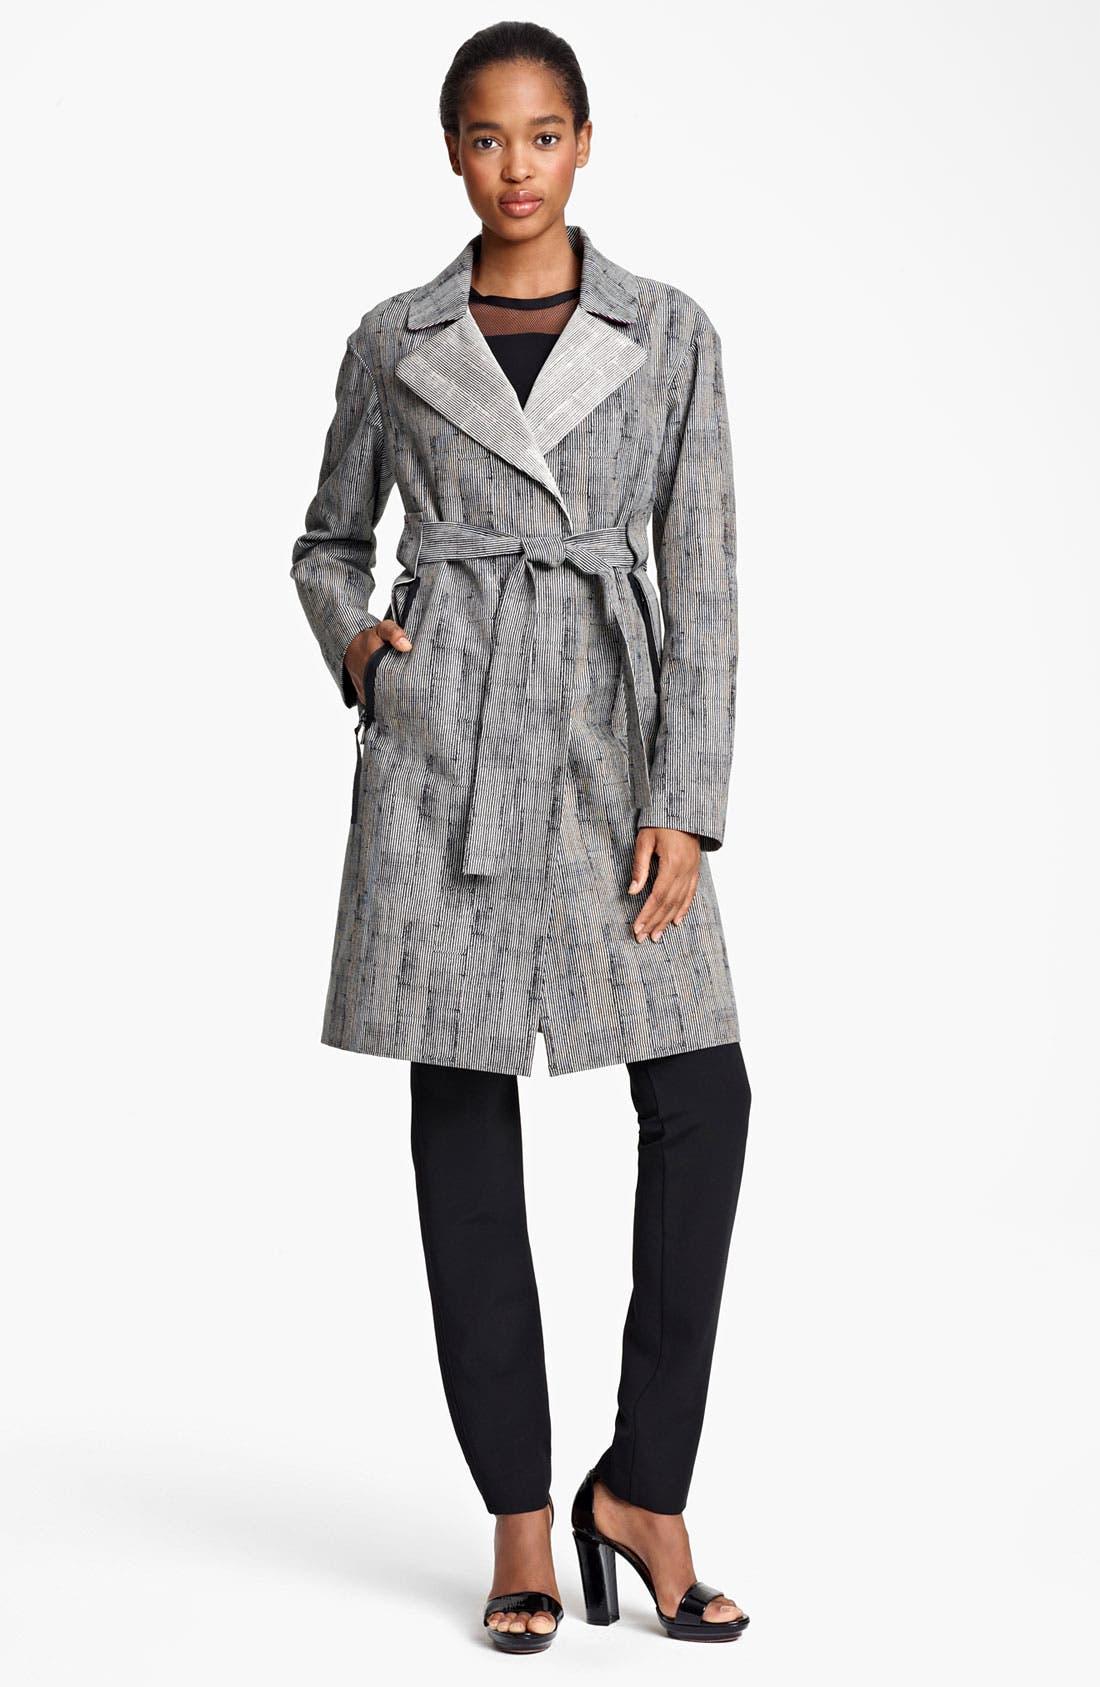 Alternate Image 1 Selected - Lida Baday Stripe Jacquard Trench Coat